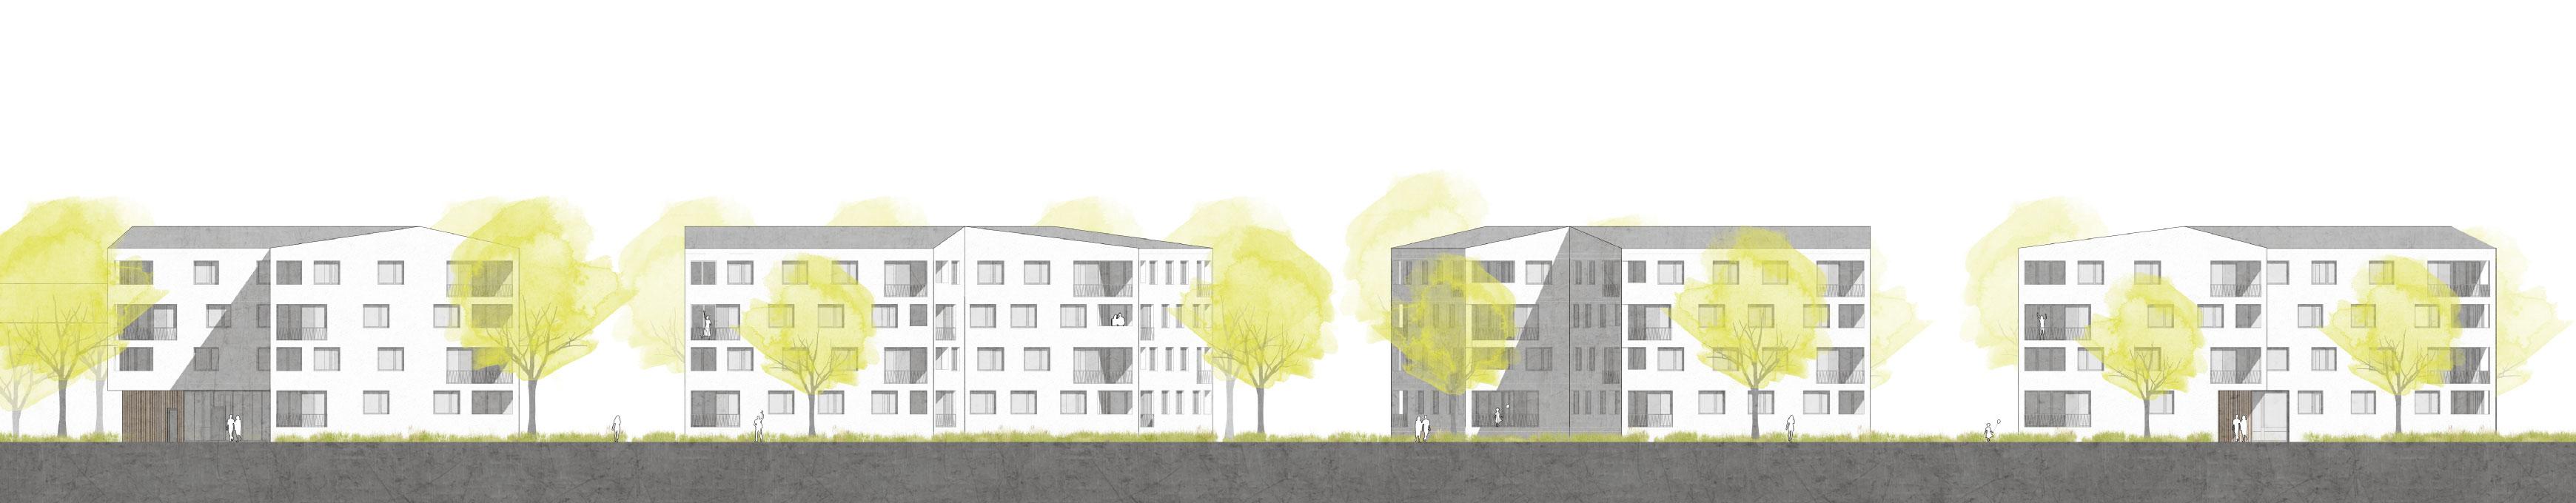 STUDIOKUBIK-architektur-architecture-berlin-wohnanlage-karl-wagner-straße-bad-aibling-sc4